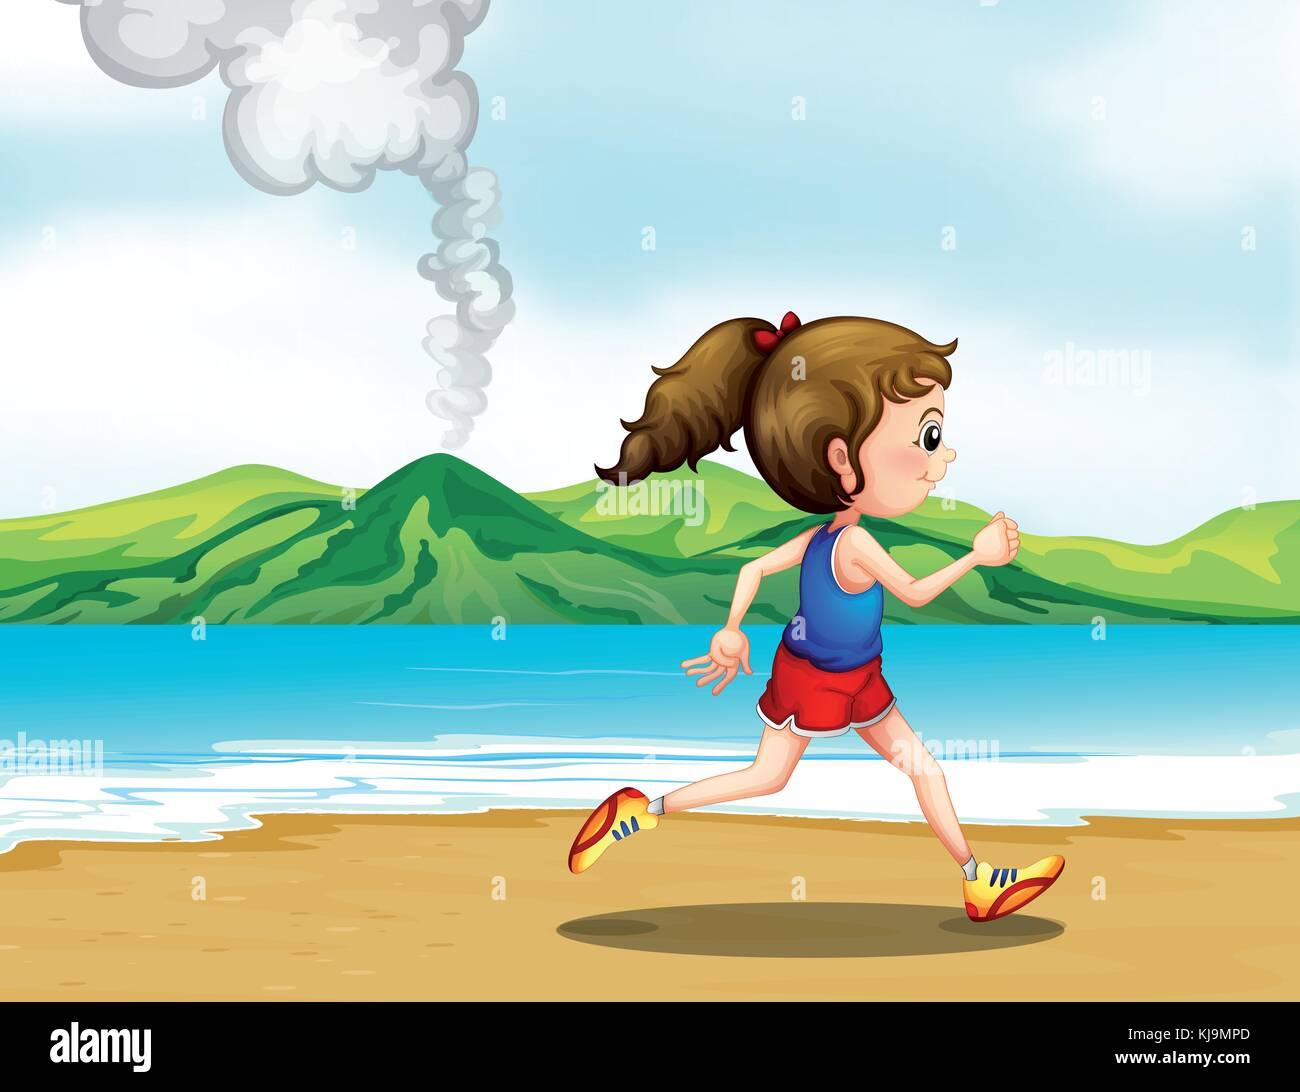 Illustration of a girl jogging at the seashore - Stock Vector